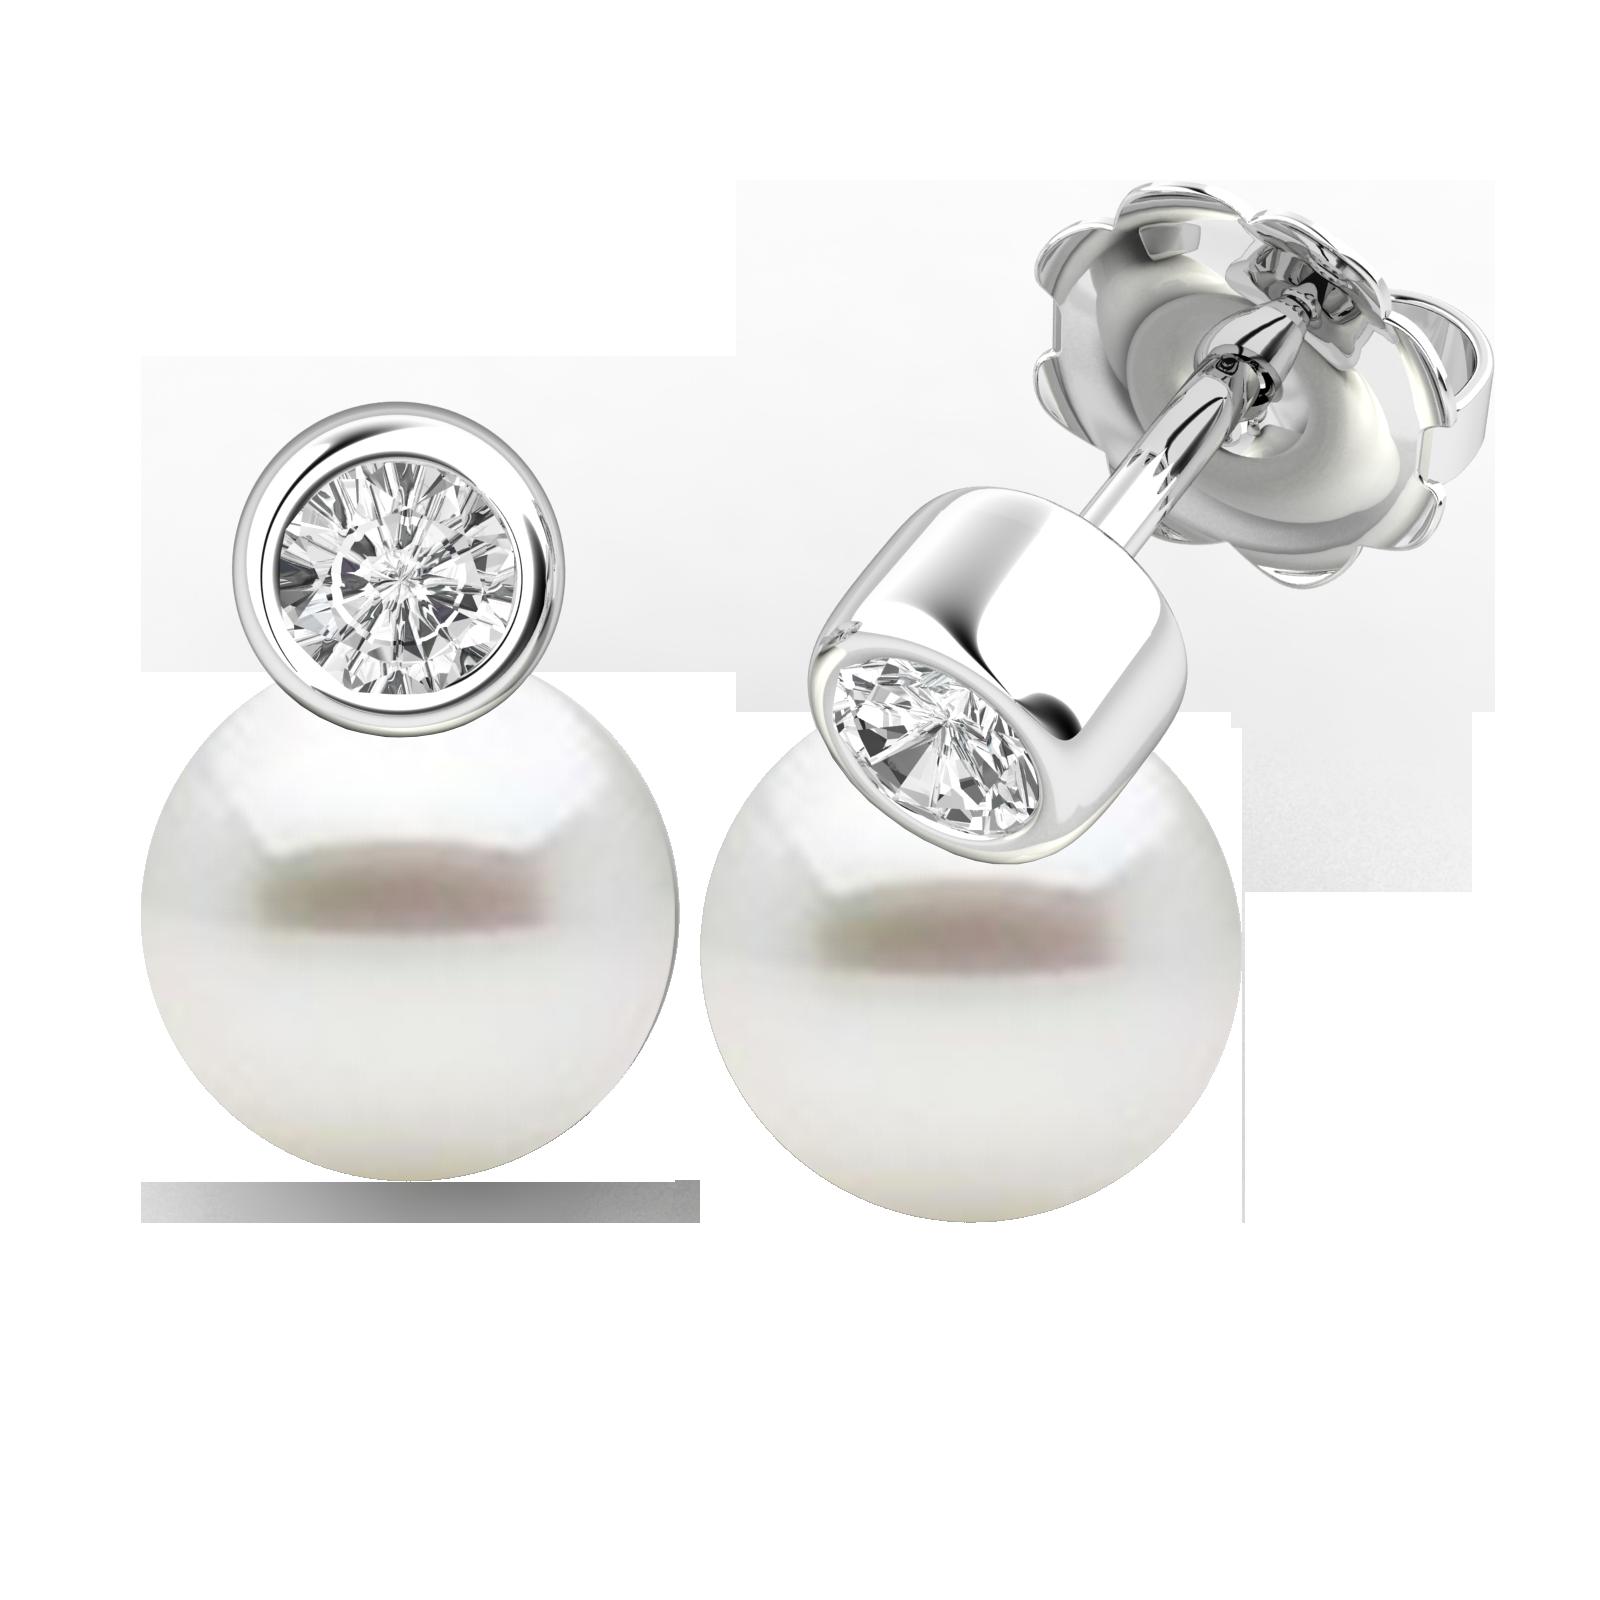 Cercei Aur Alb 18kt cu Perle Albe si Diamante Rotunde-img1